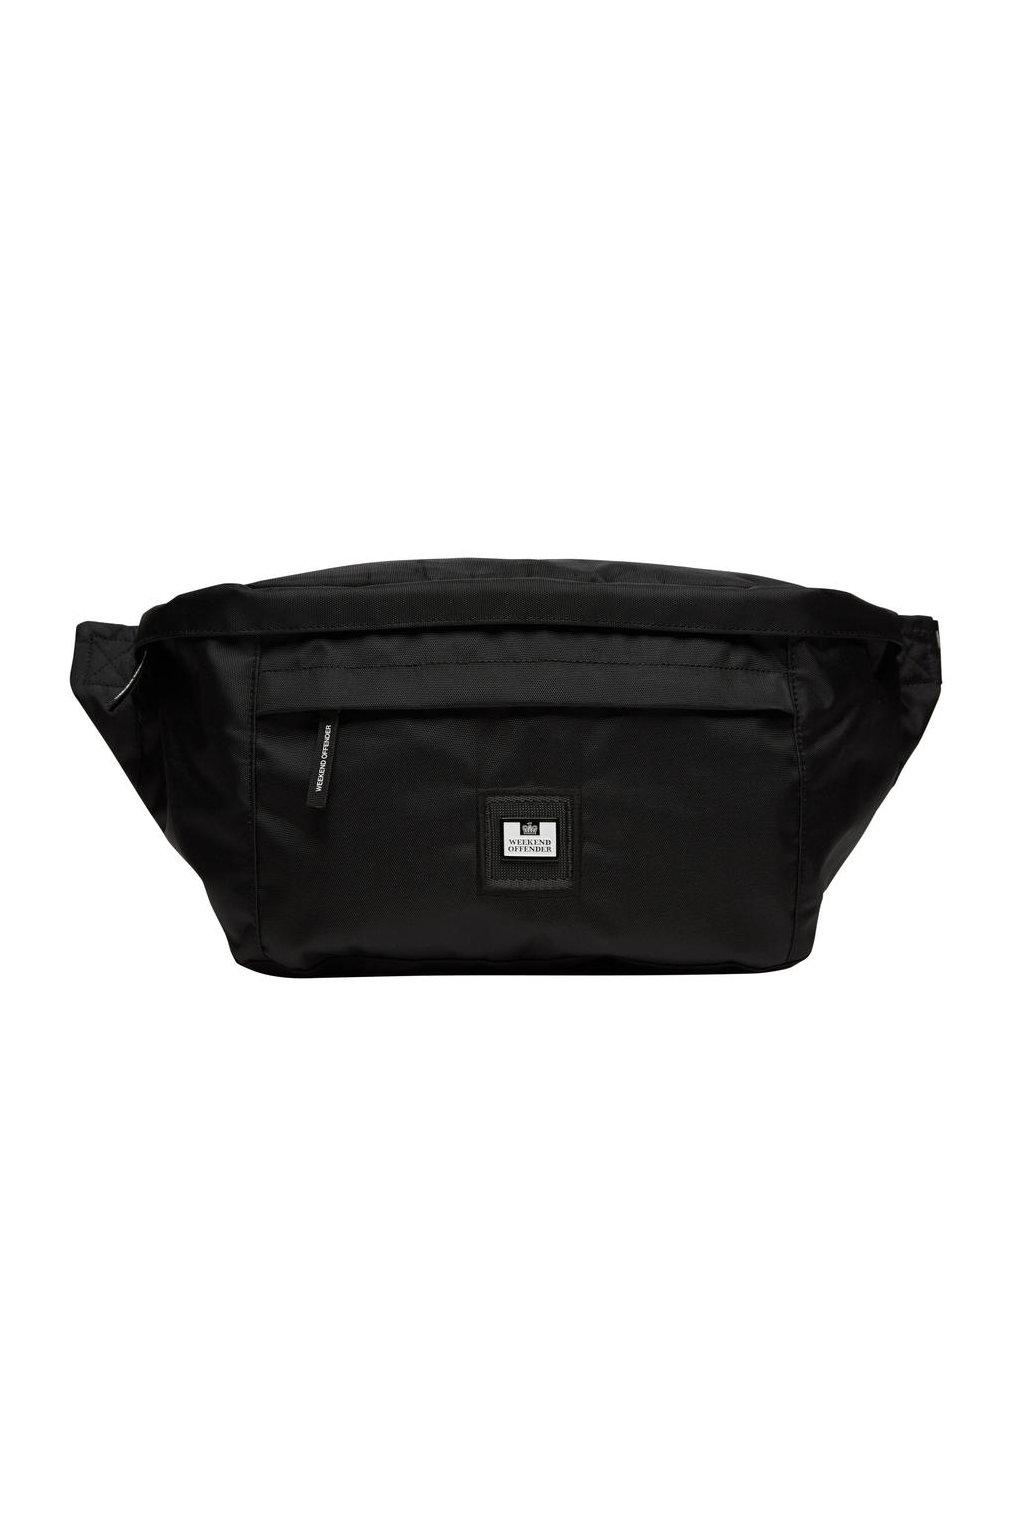 ACSS20 BIG BODY BAG FRONT MANNEQUIN 900x